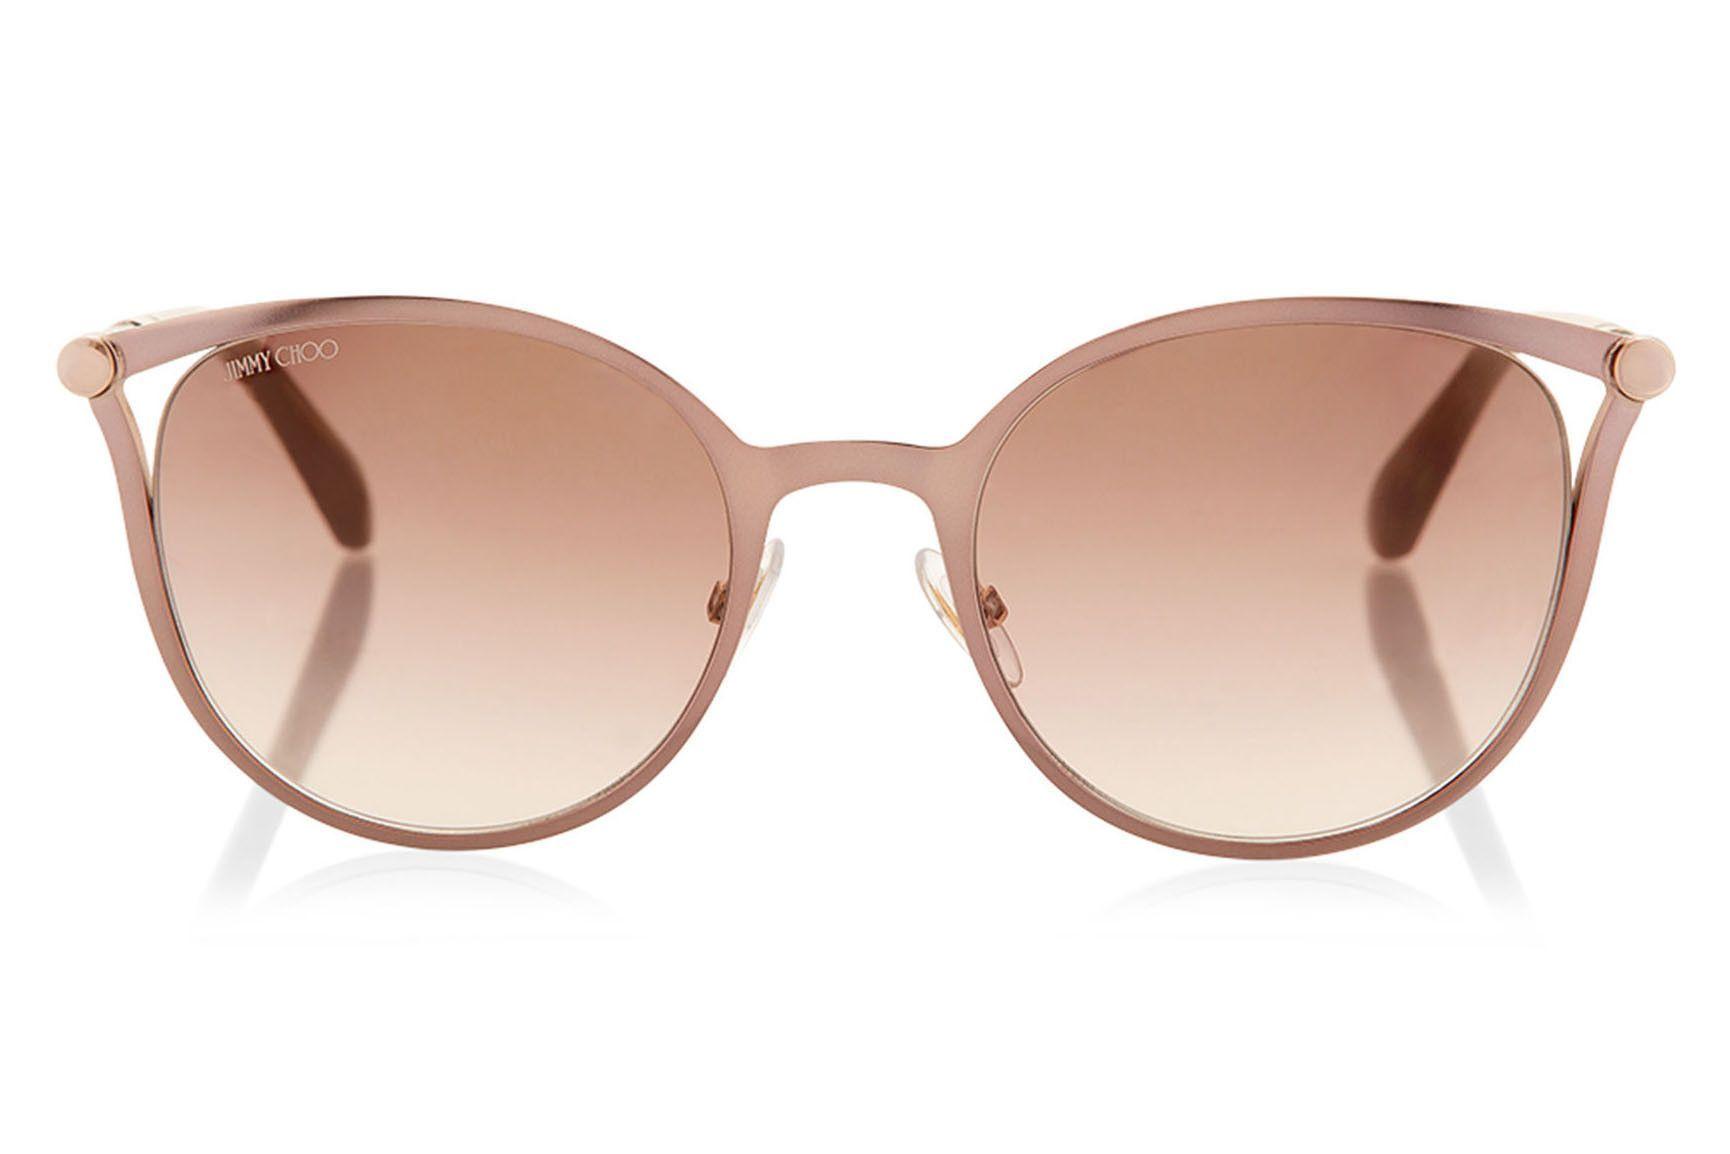 1fa88846a135 Jimmy Choo - Neiza Brown Rose Gold Cat-Eye Sunglasses